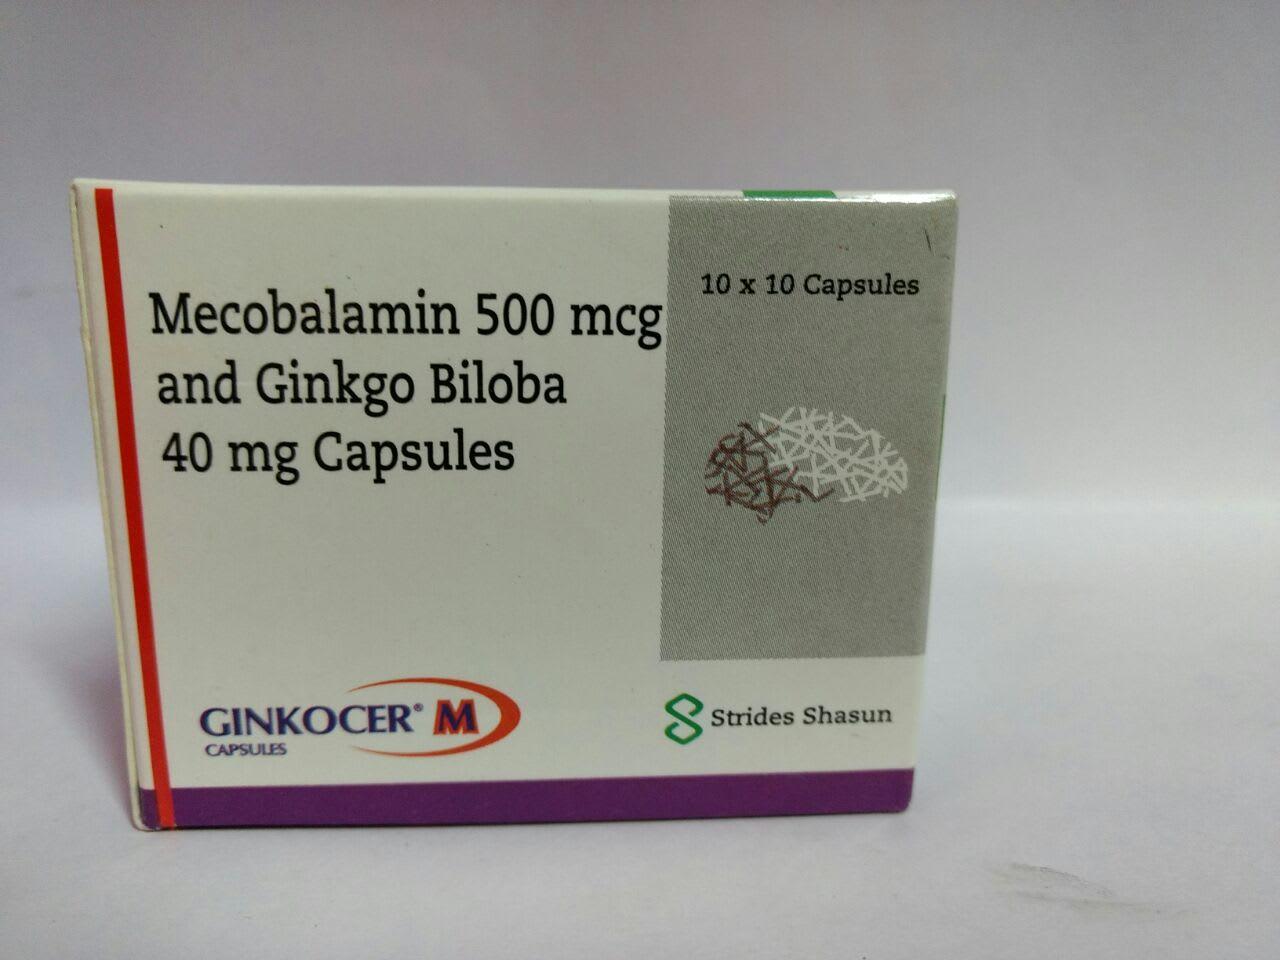 Ginkocer-M  Capsule